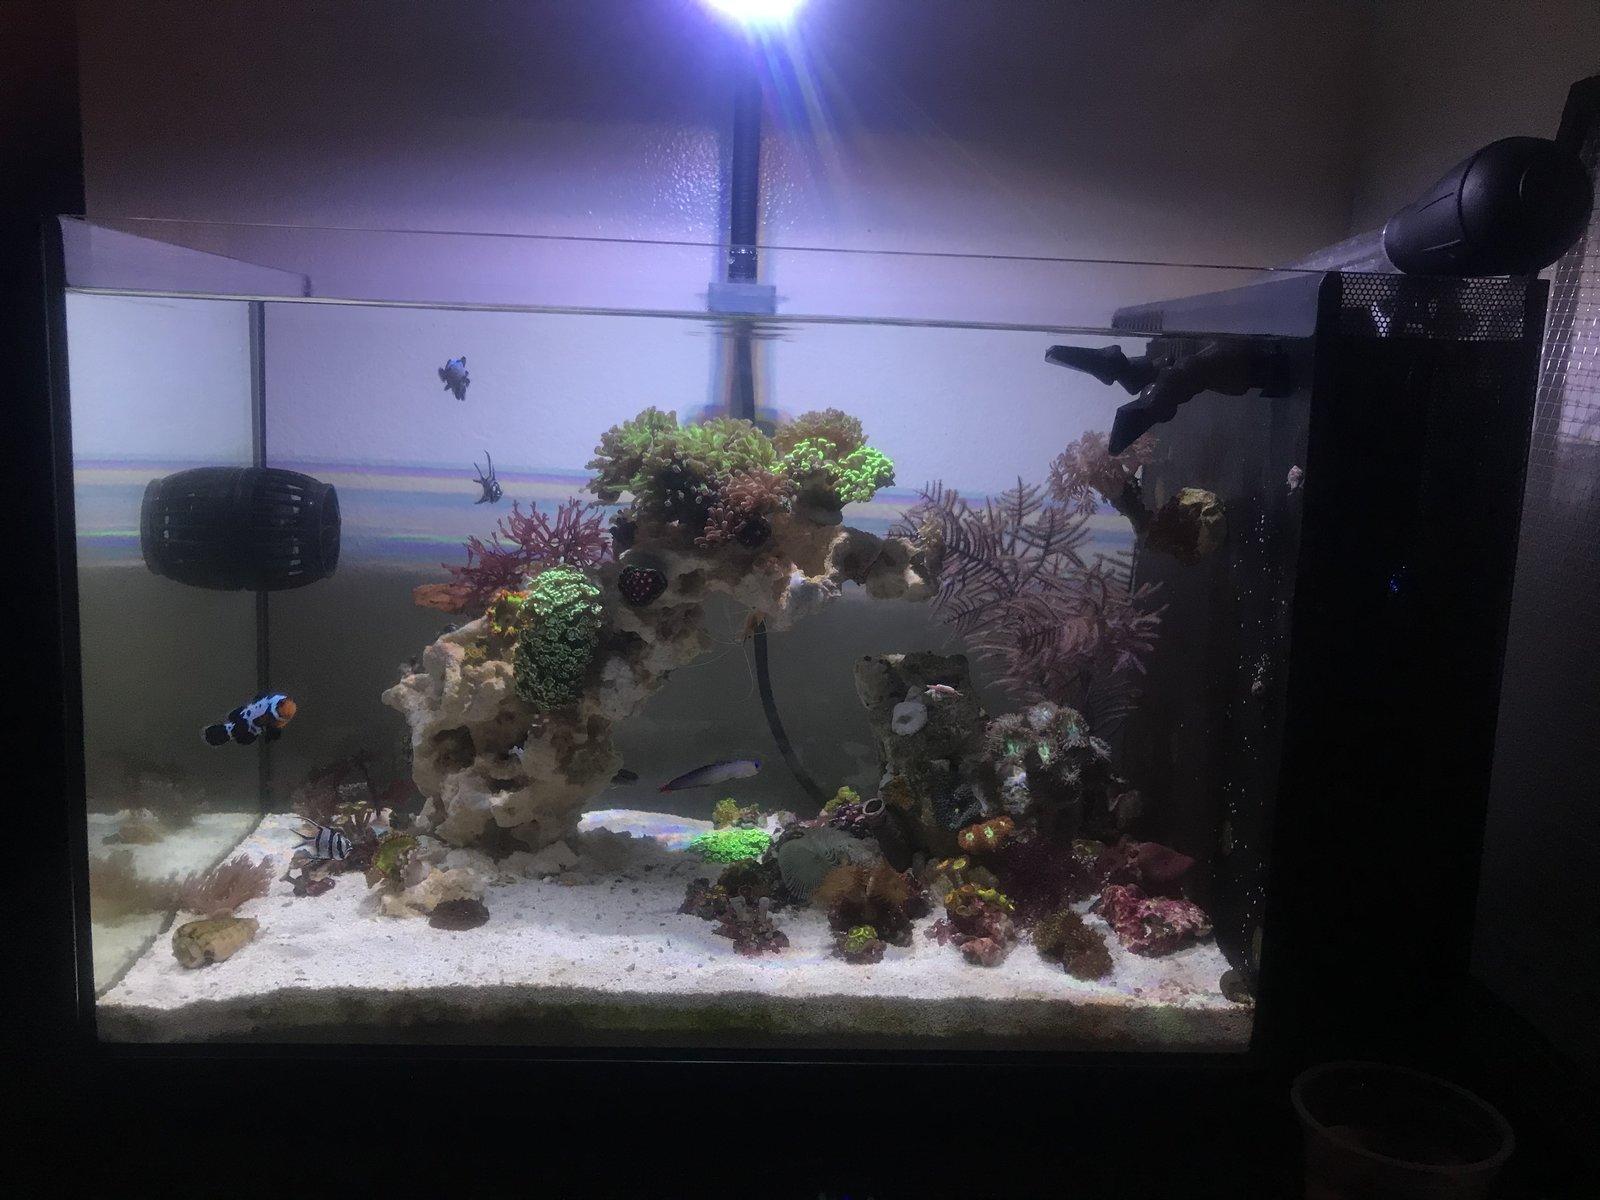 Rock Flower Anemones Dying Help Invertebrate Forum Nano Reef Community